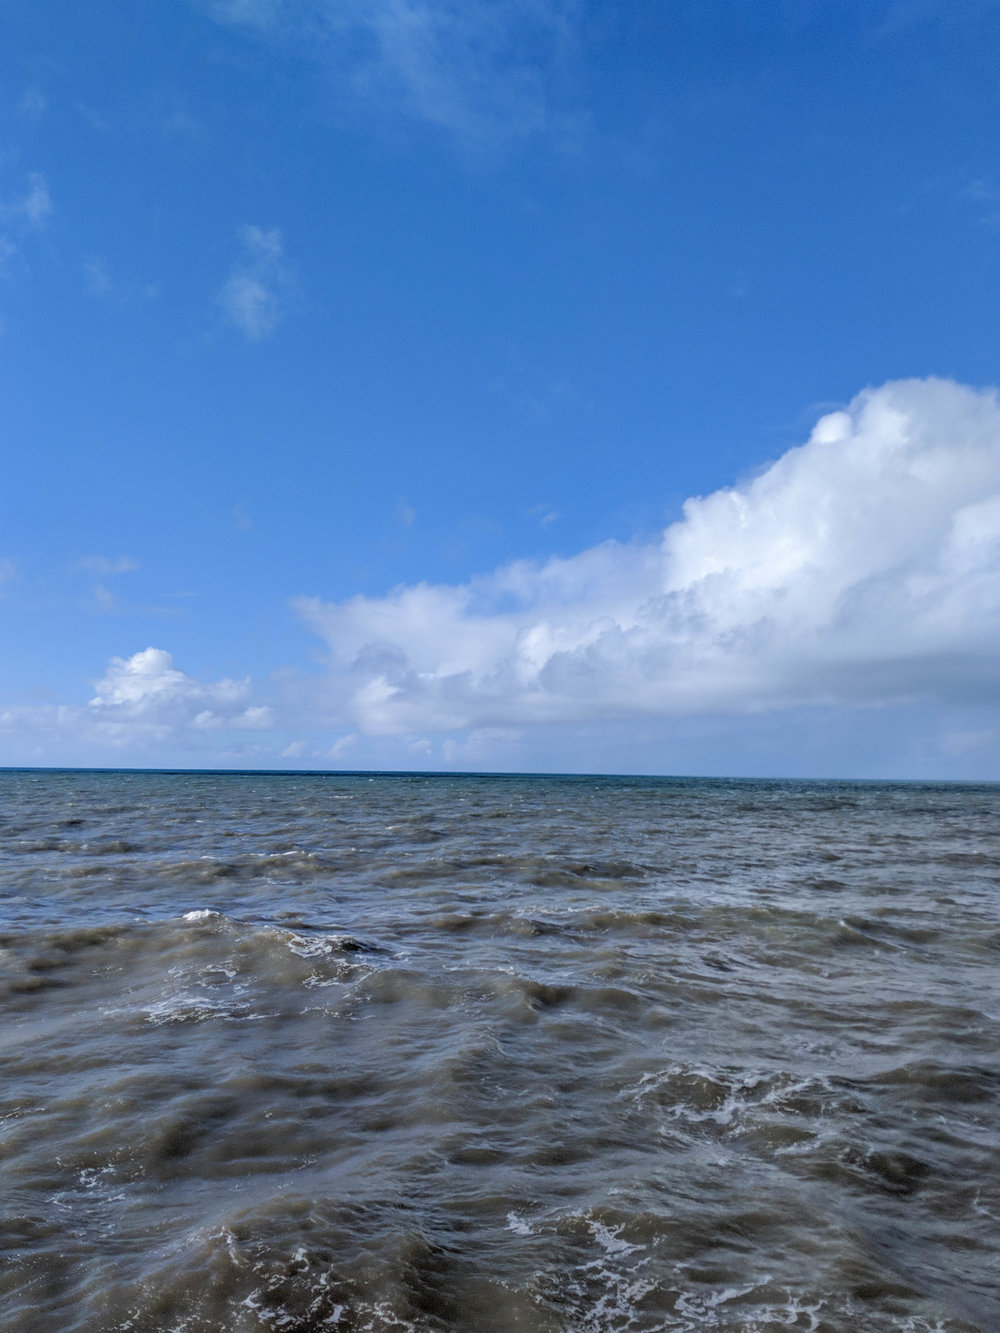 bri rinehart; photography; california; pismo beach; ocean